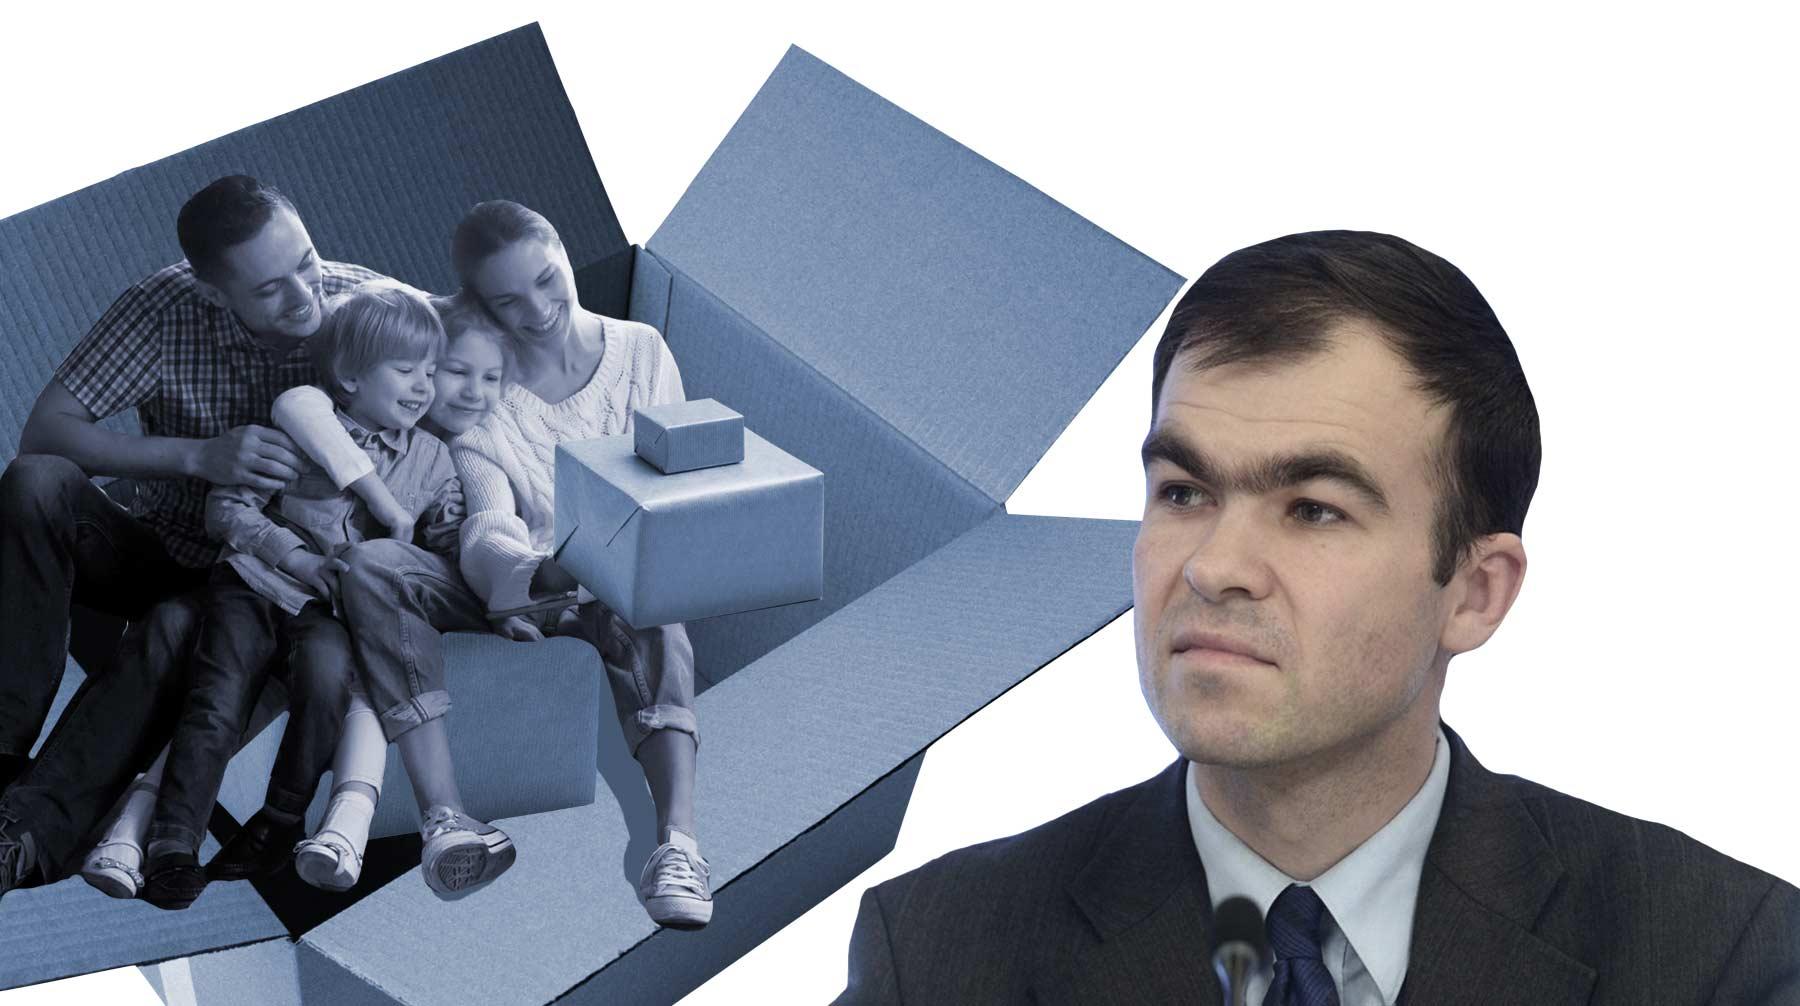 Зампред СПЧ предложил ограничить ипотеку малоимущим